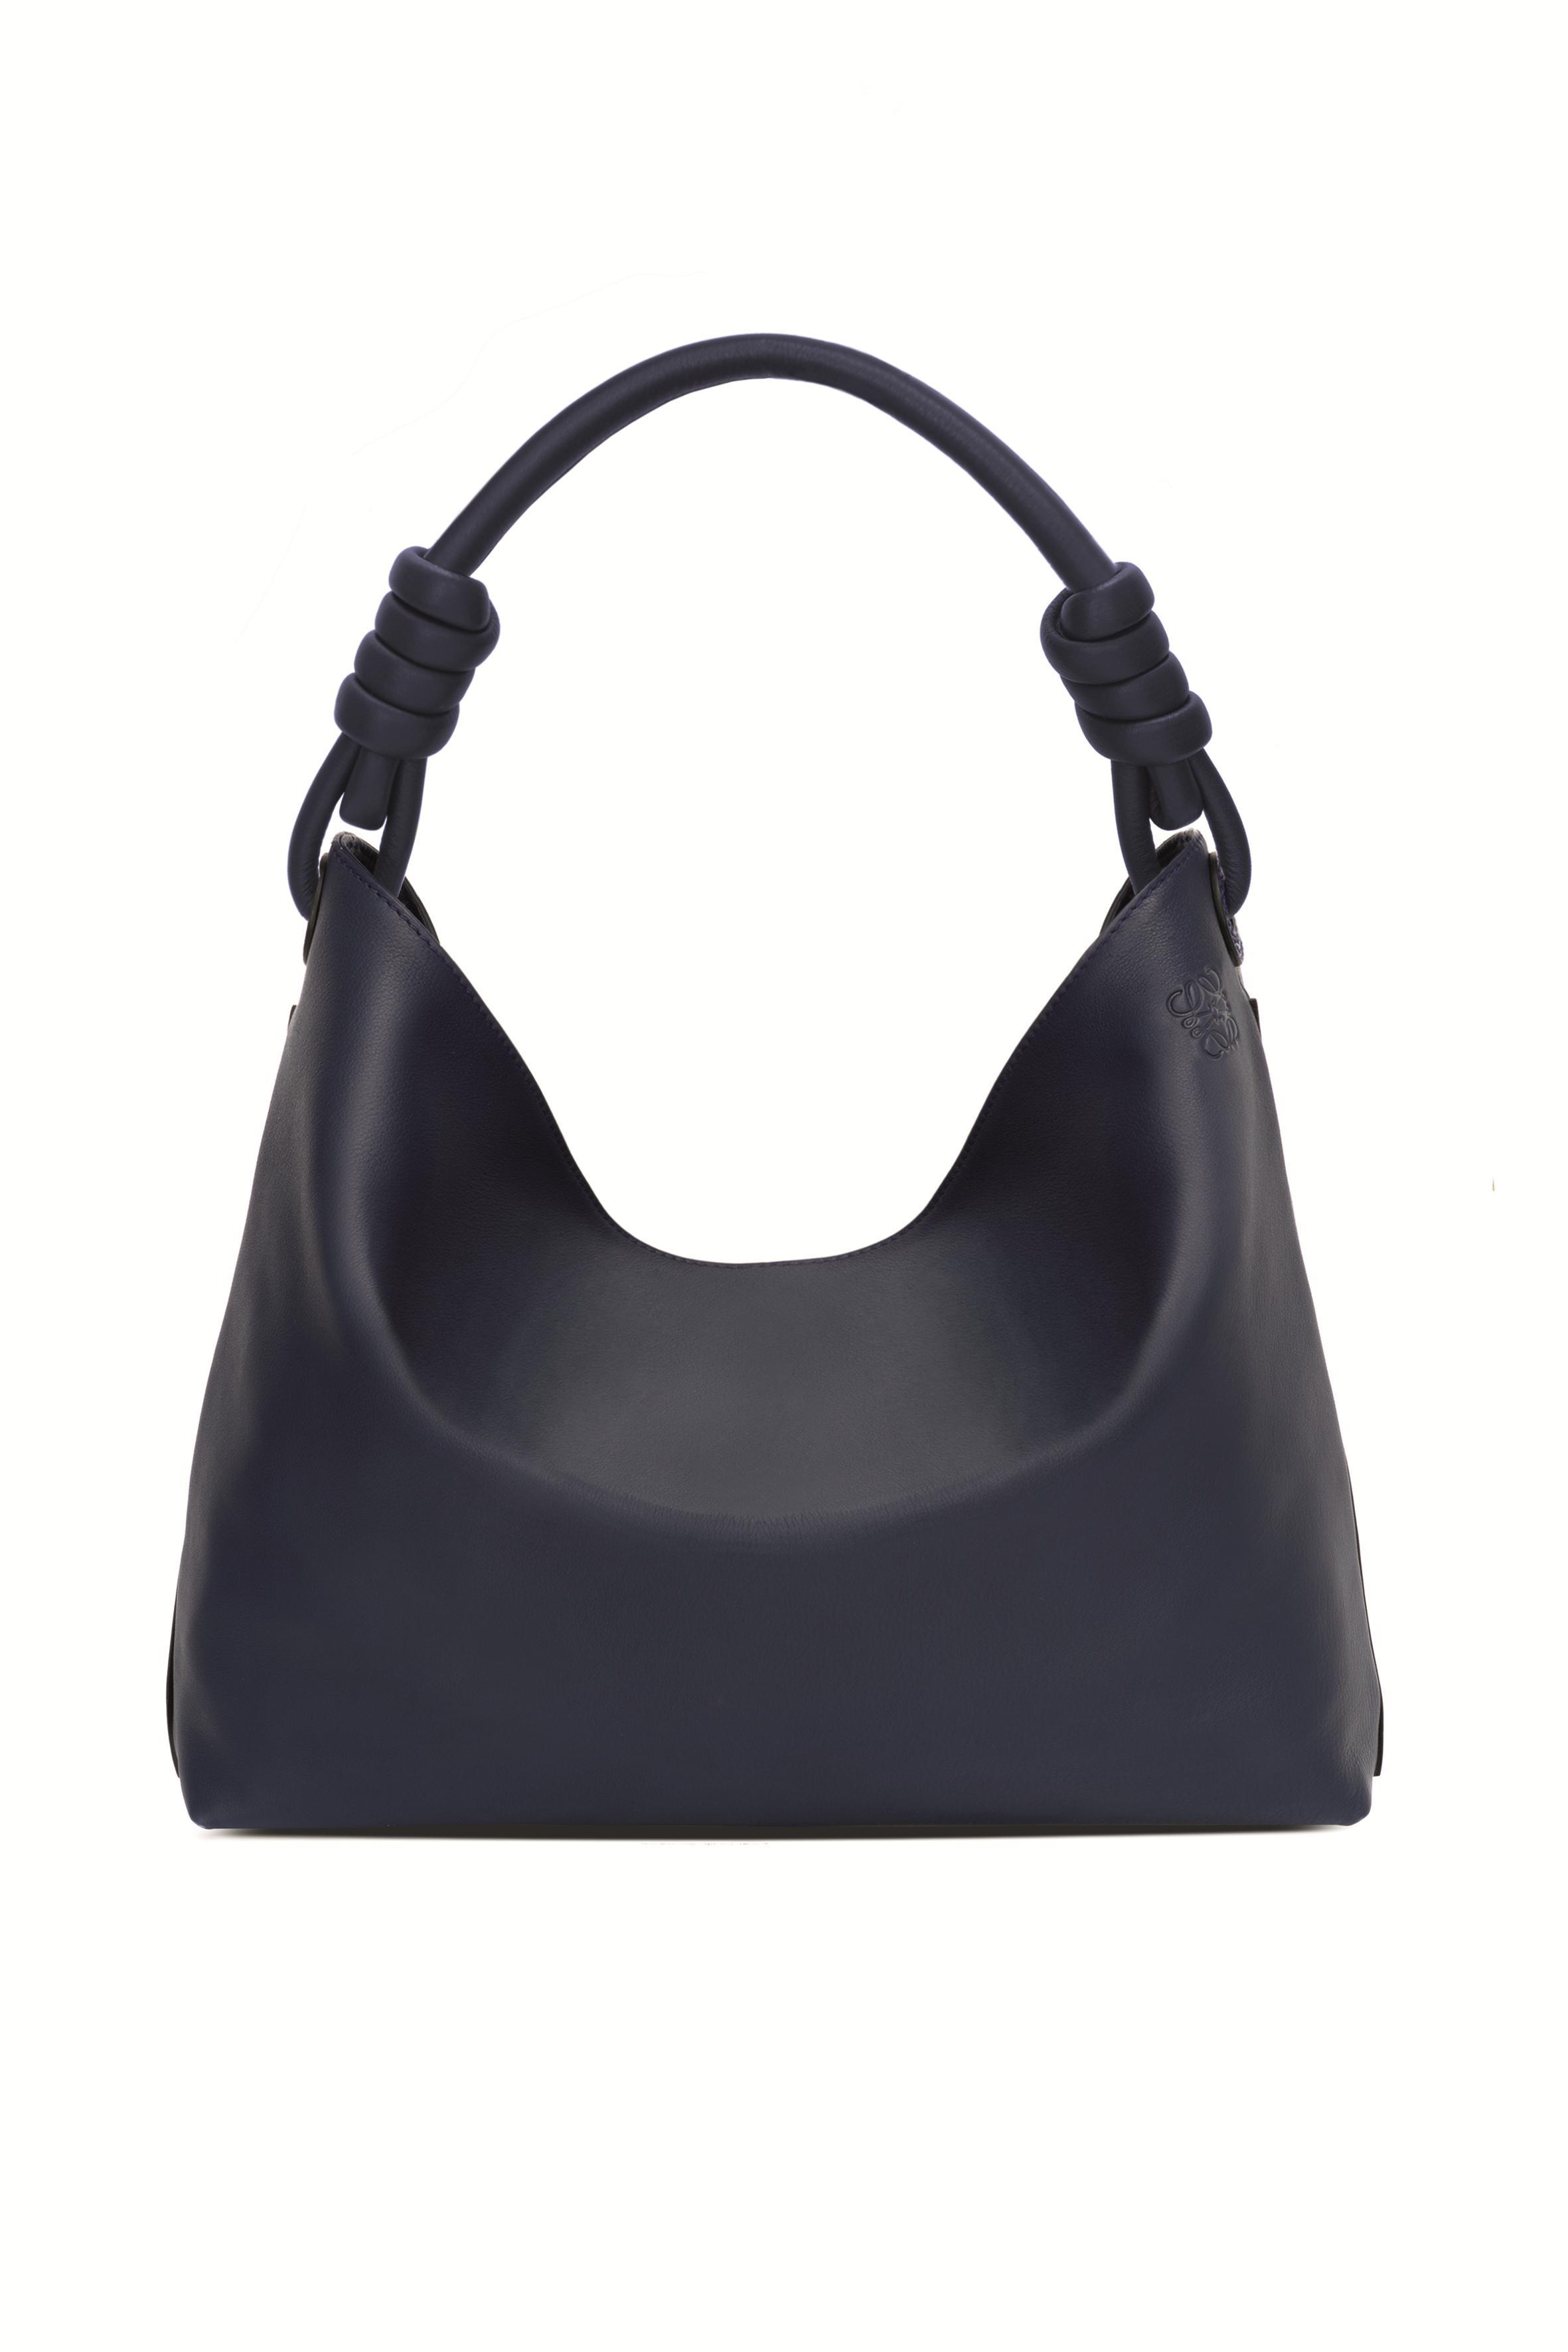 Flamenco Hobo海軍藍小型手袋 NT$65,000